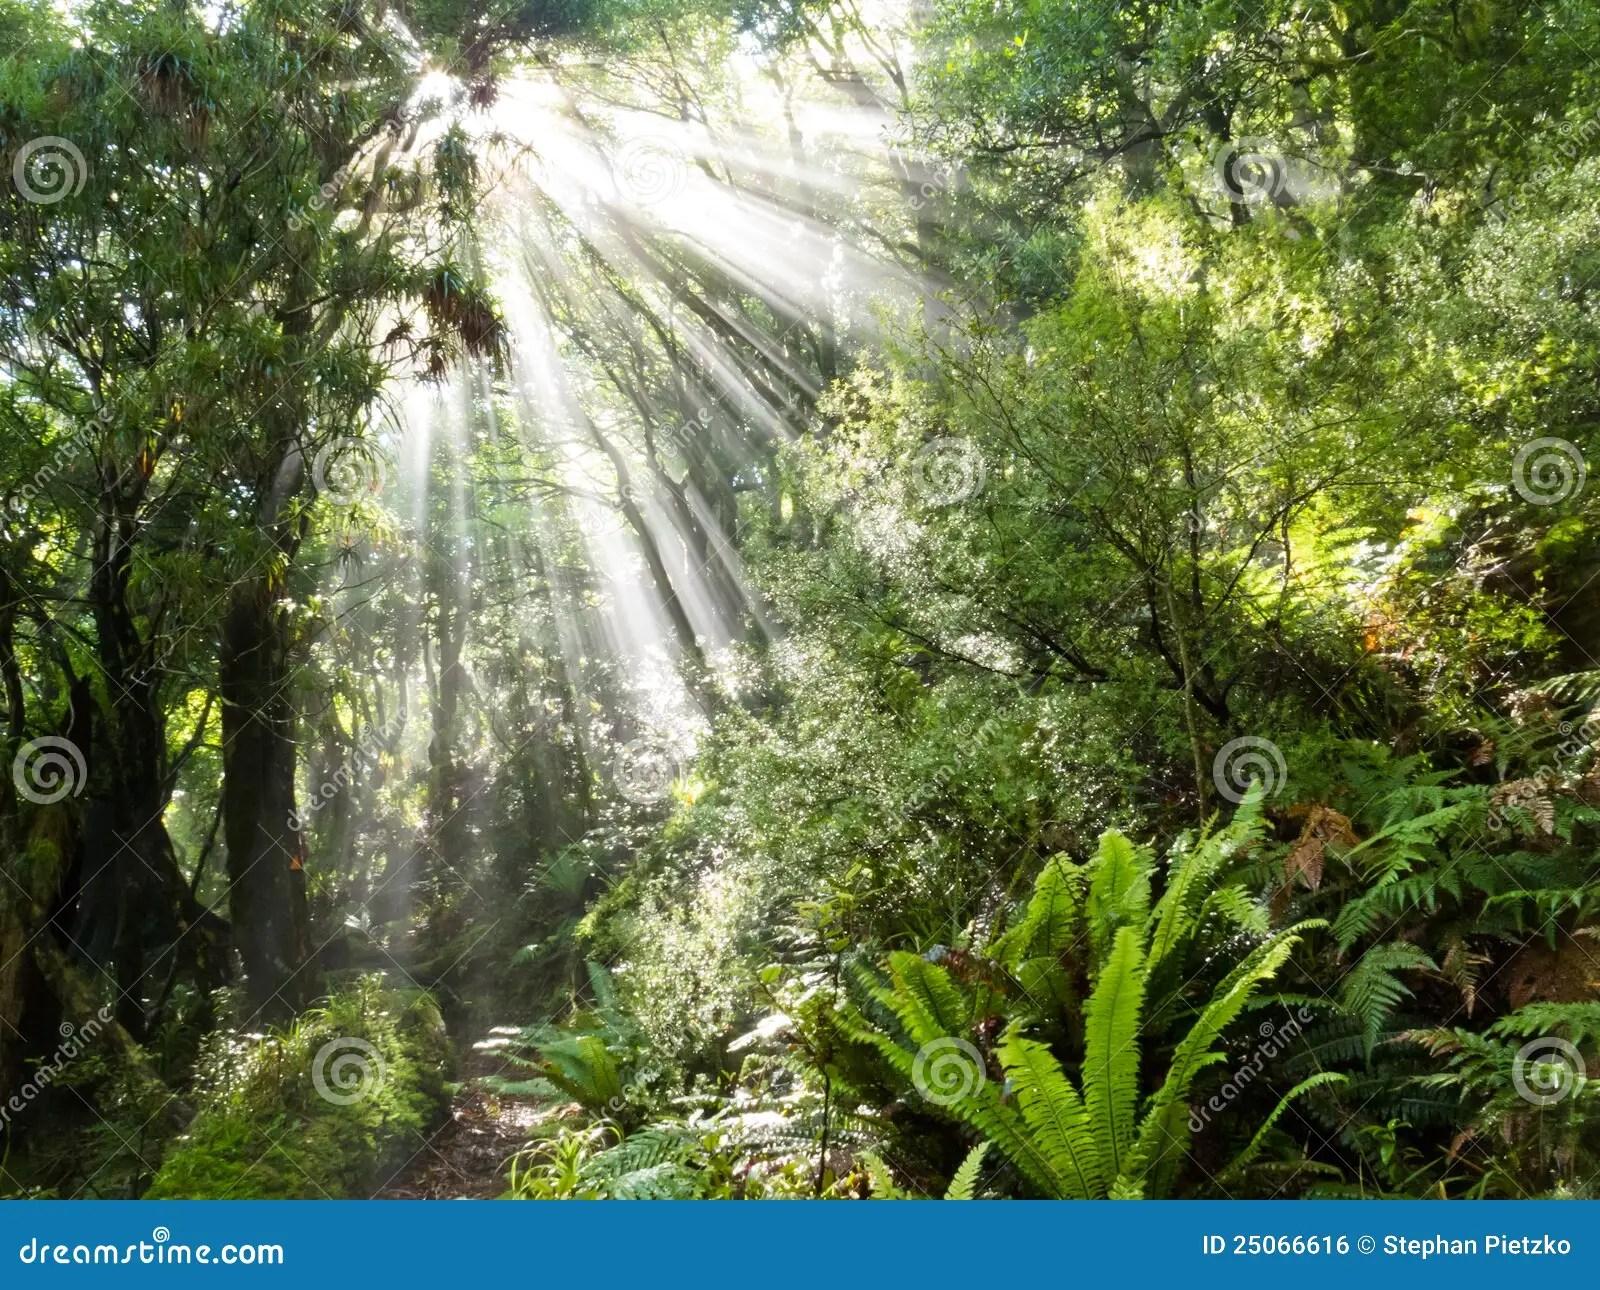 Rays Of Sunlight Beam Trough Dense Tropical Jungle Stock